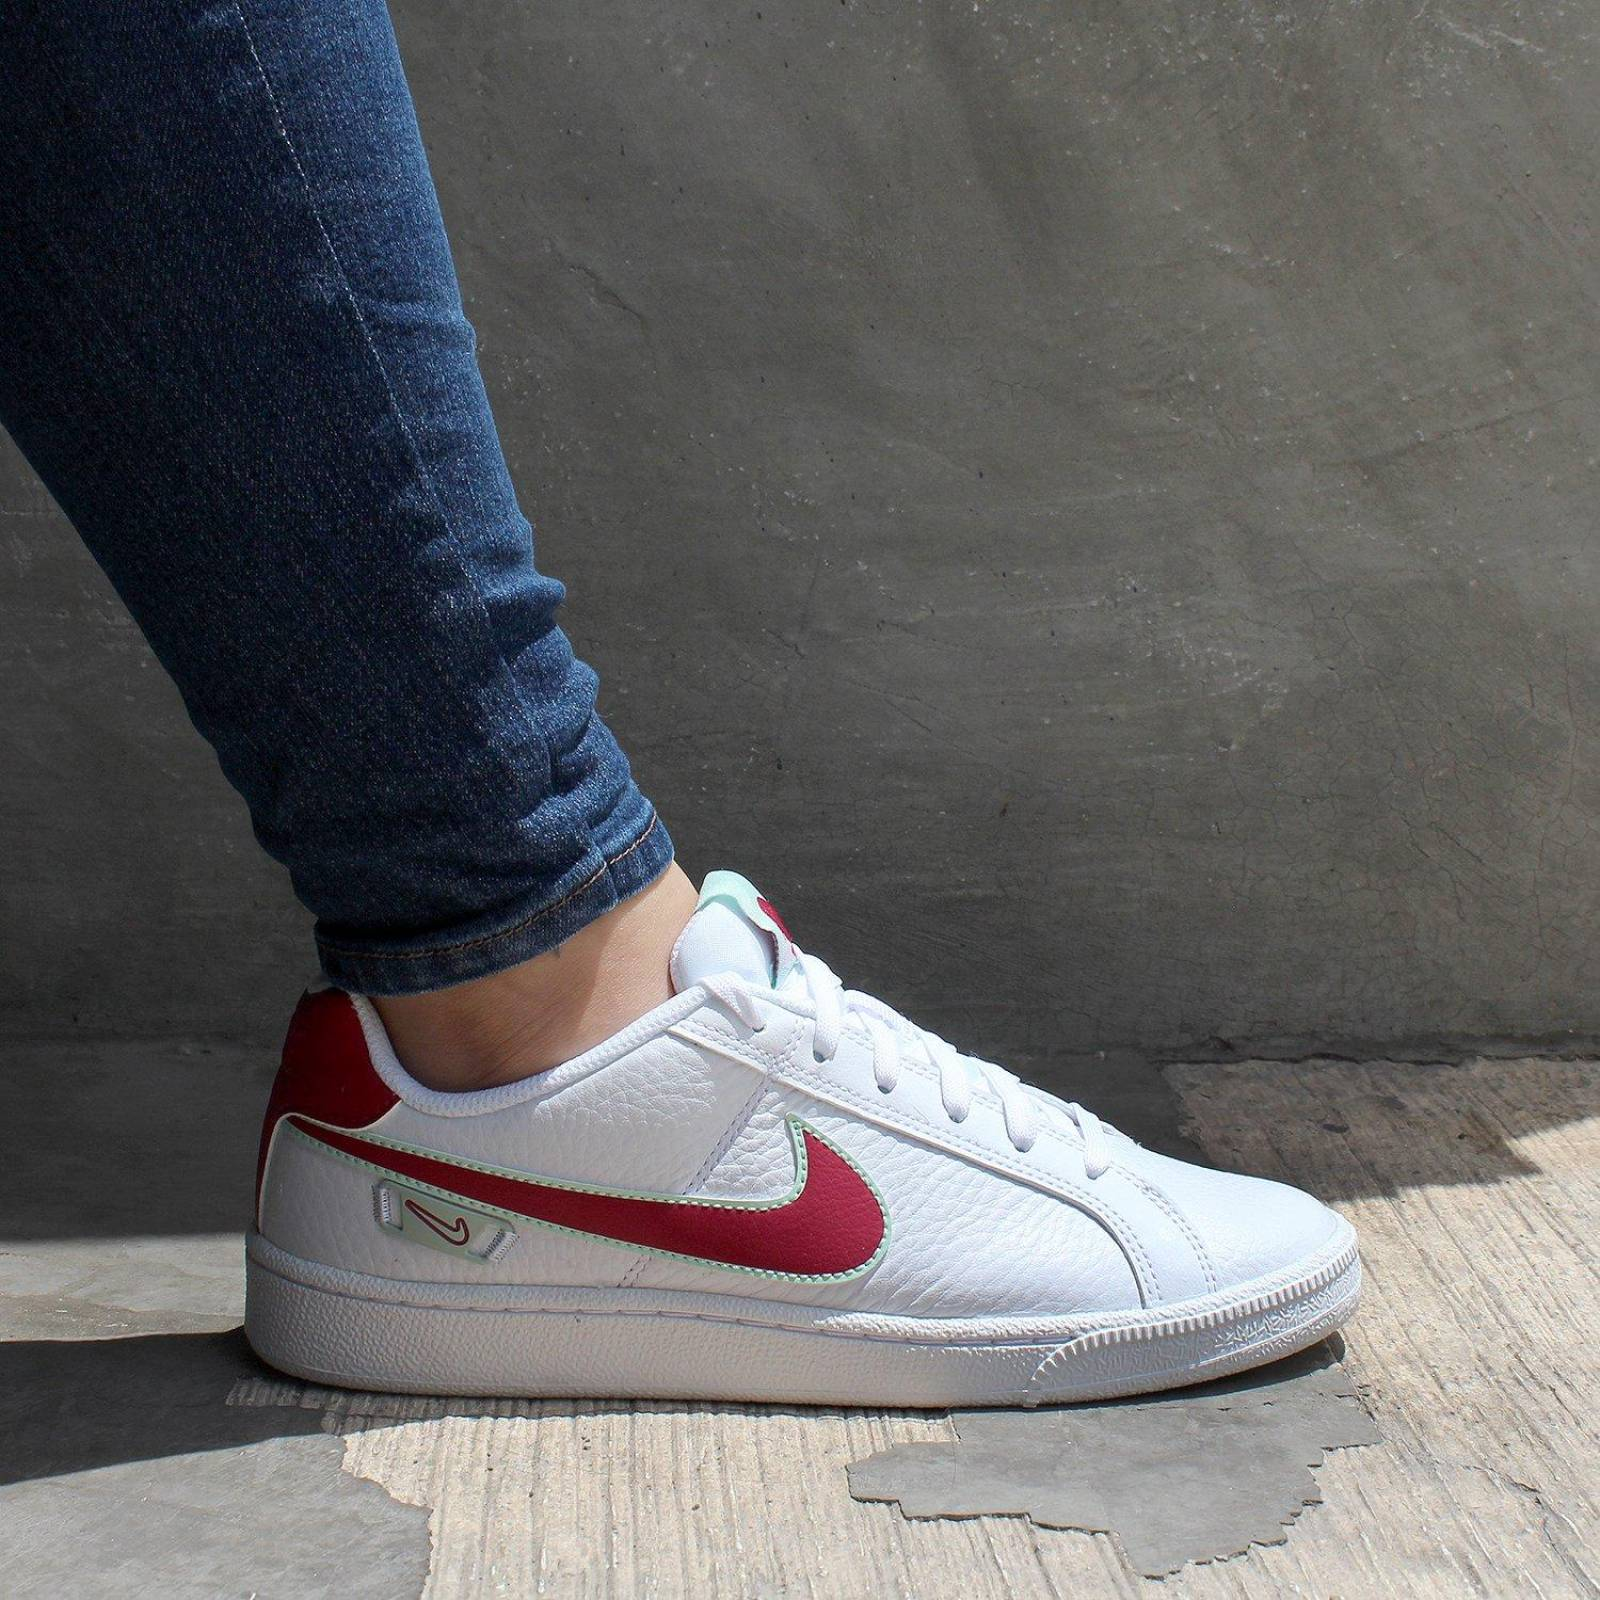 recinto Lamer embargo  Tenis Nike Court Royale Premium - CI7824100 - Blanco - Mujer